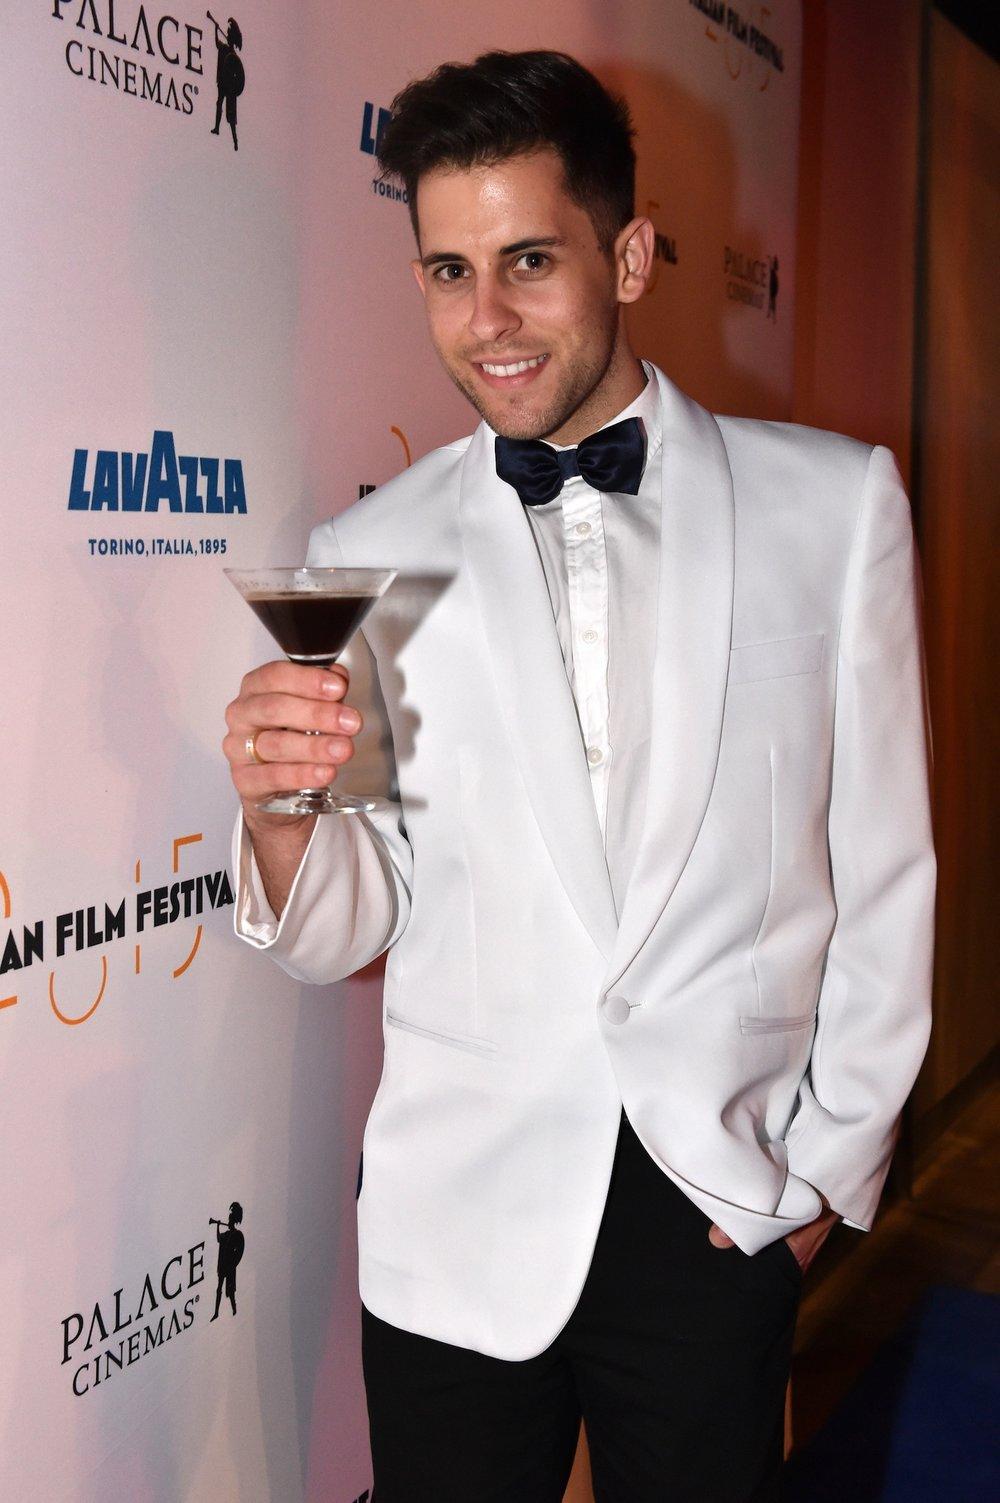 lavazza-italian-film-festival-2015-2.jpg